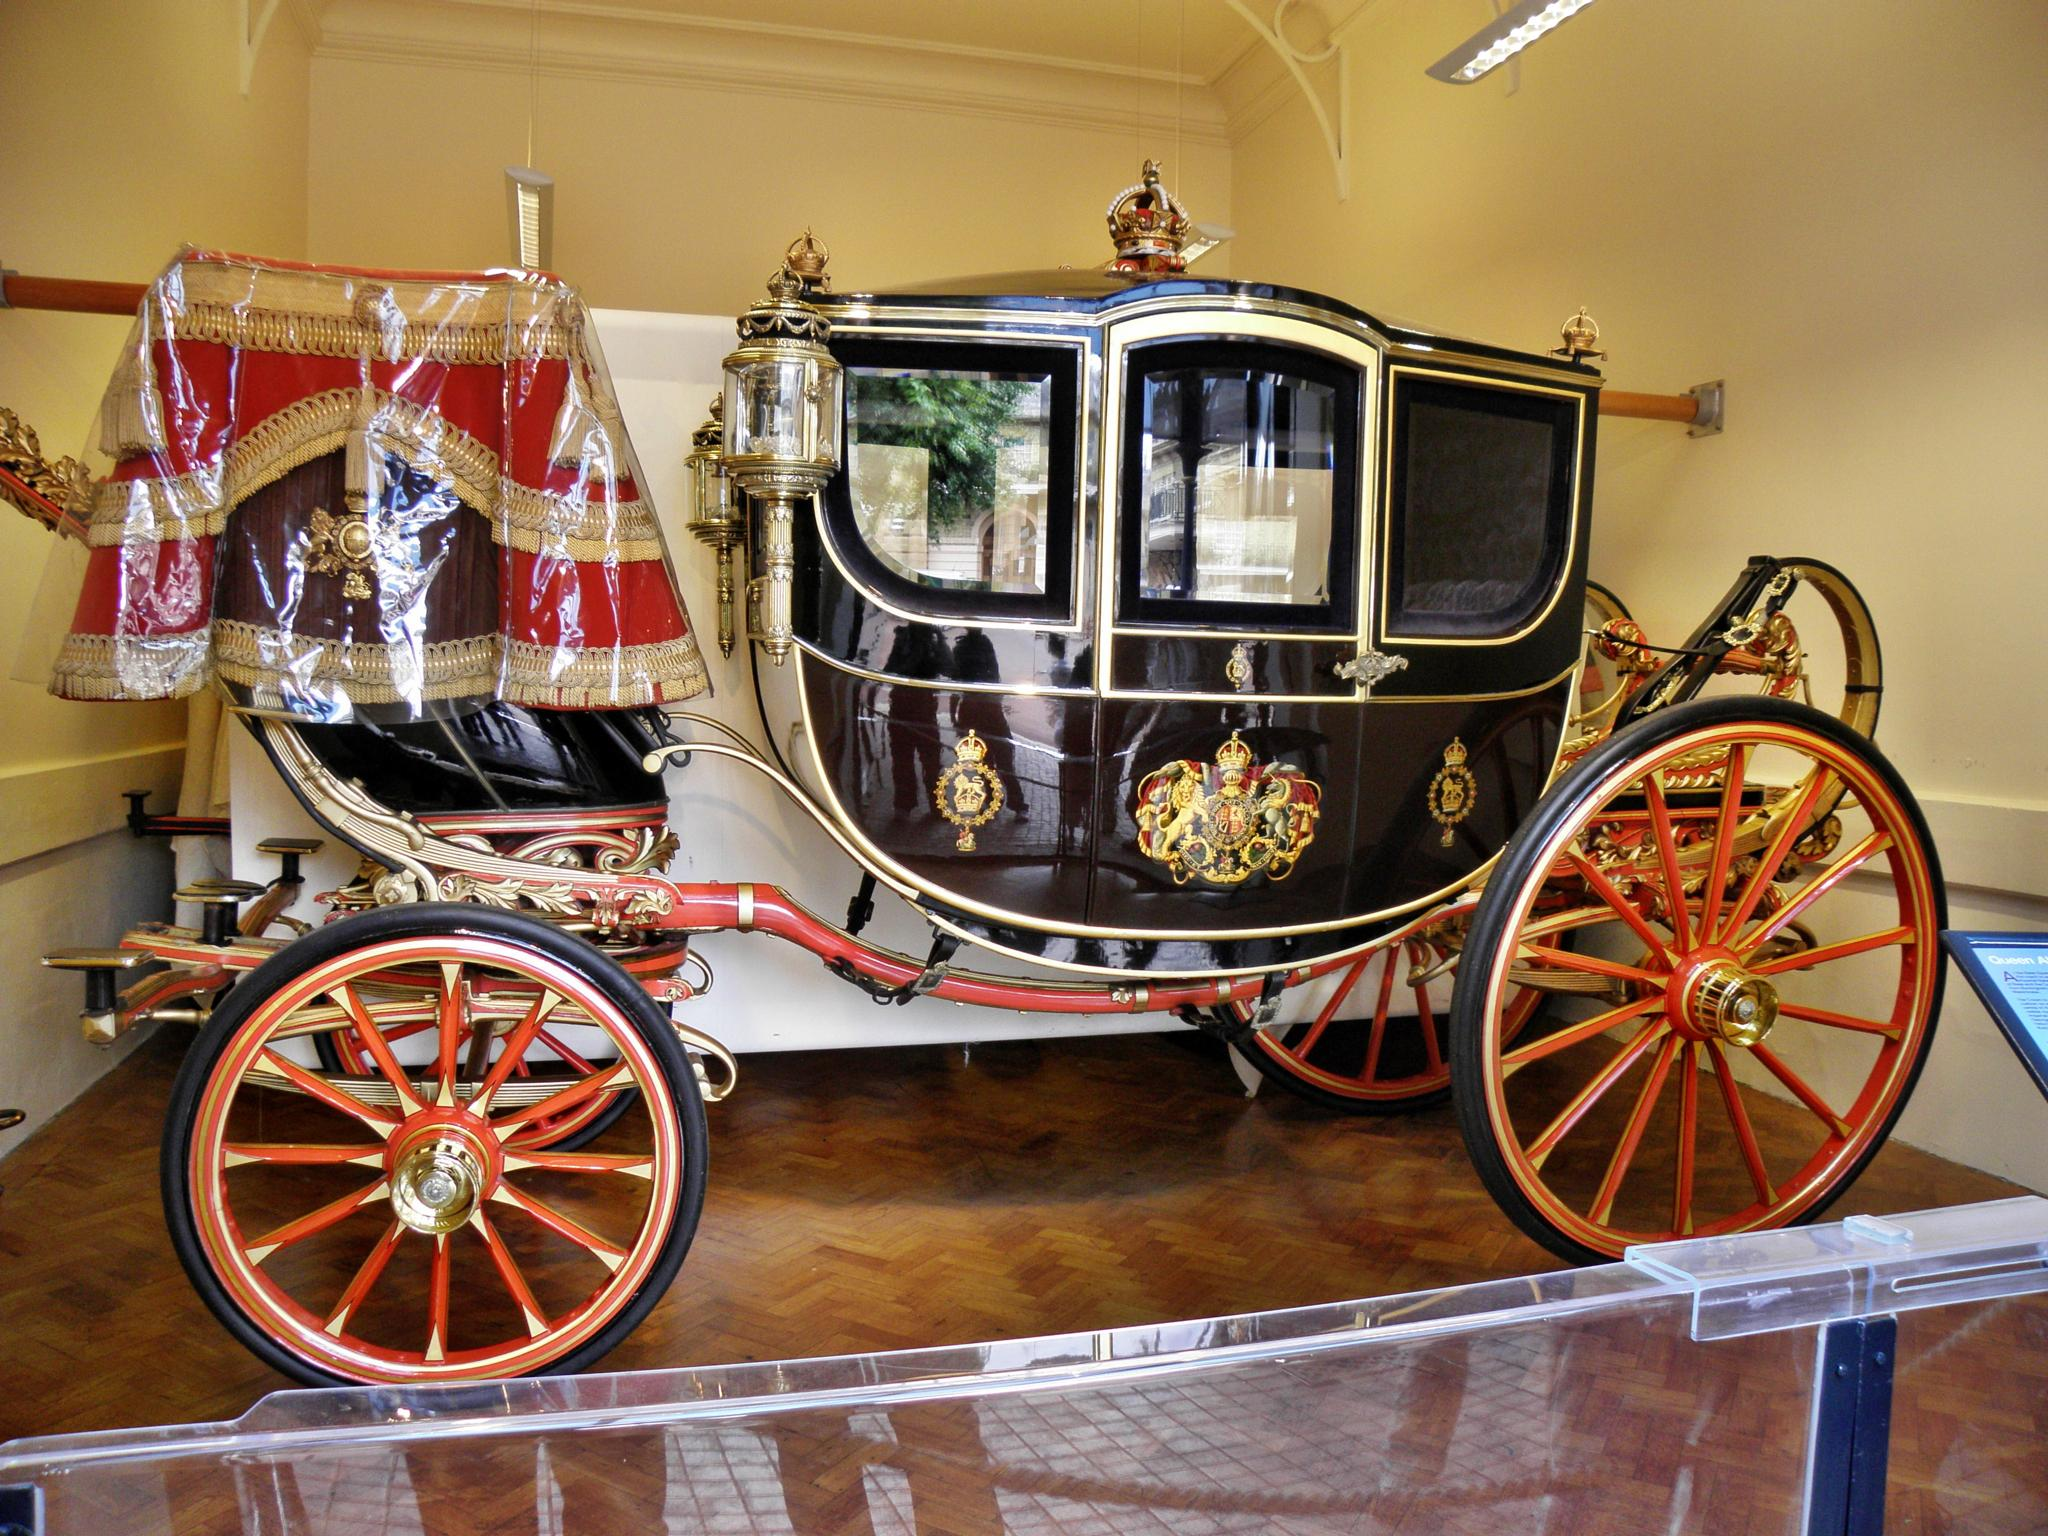 Royal Coach by Peter J Dwight